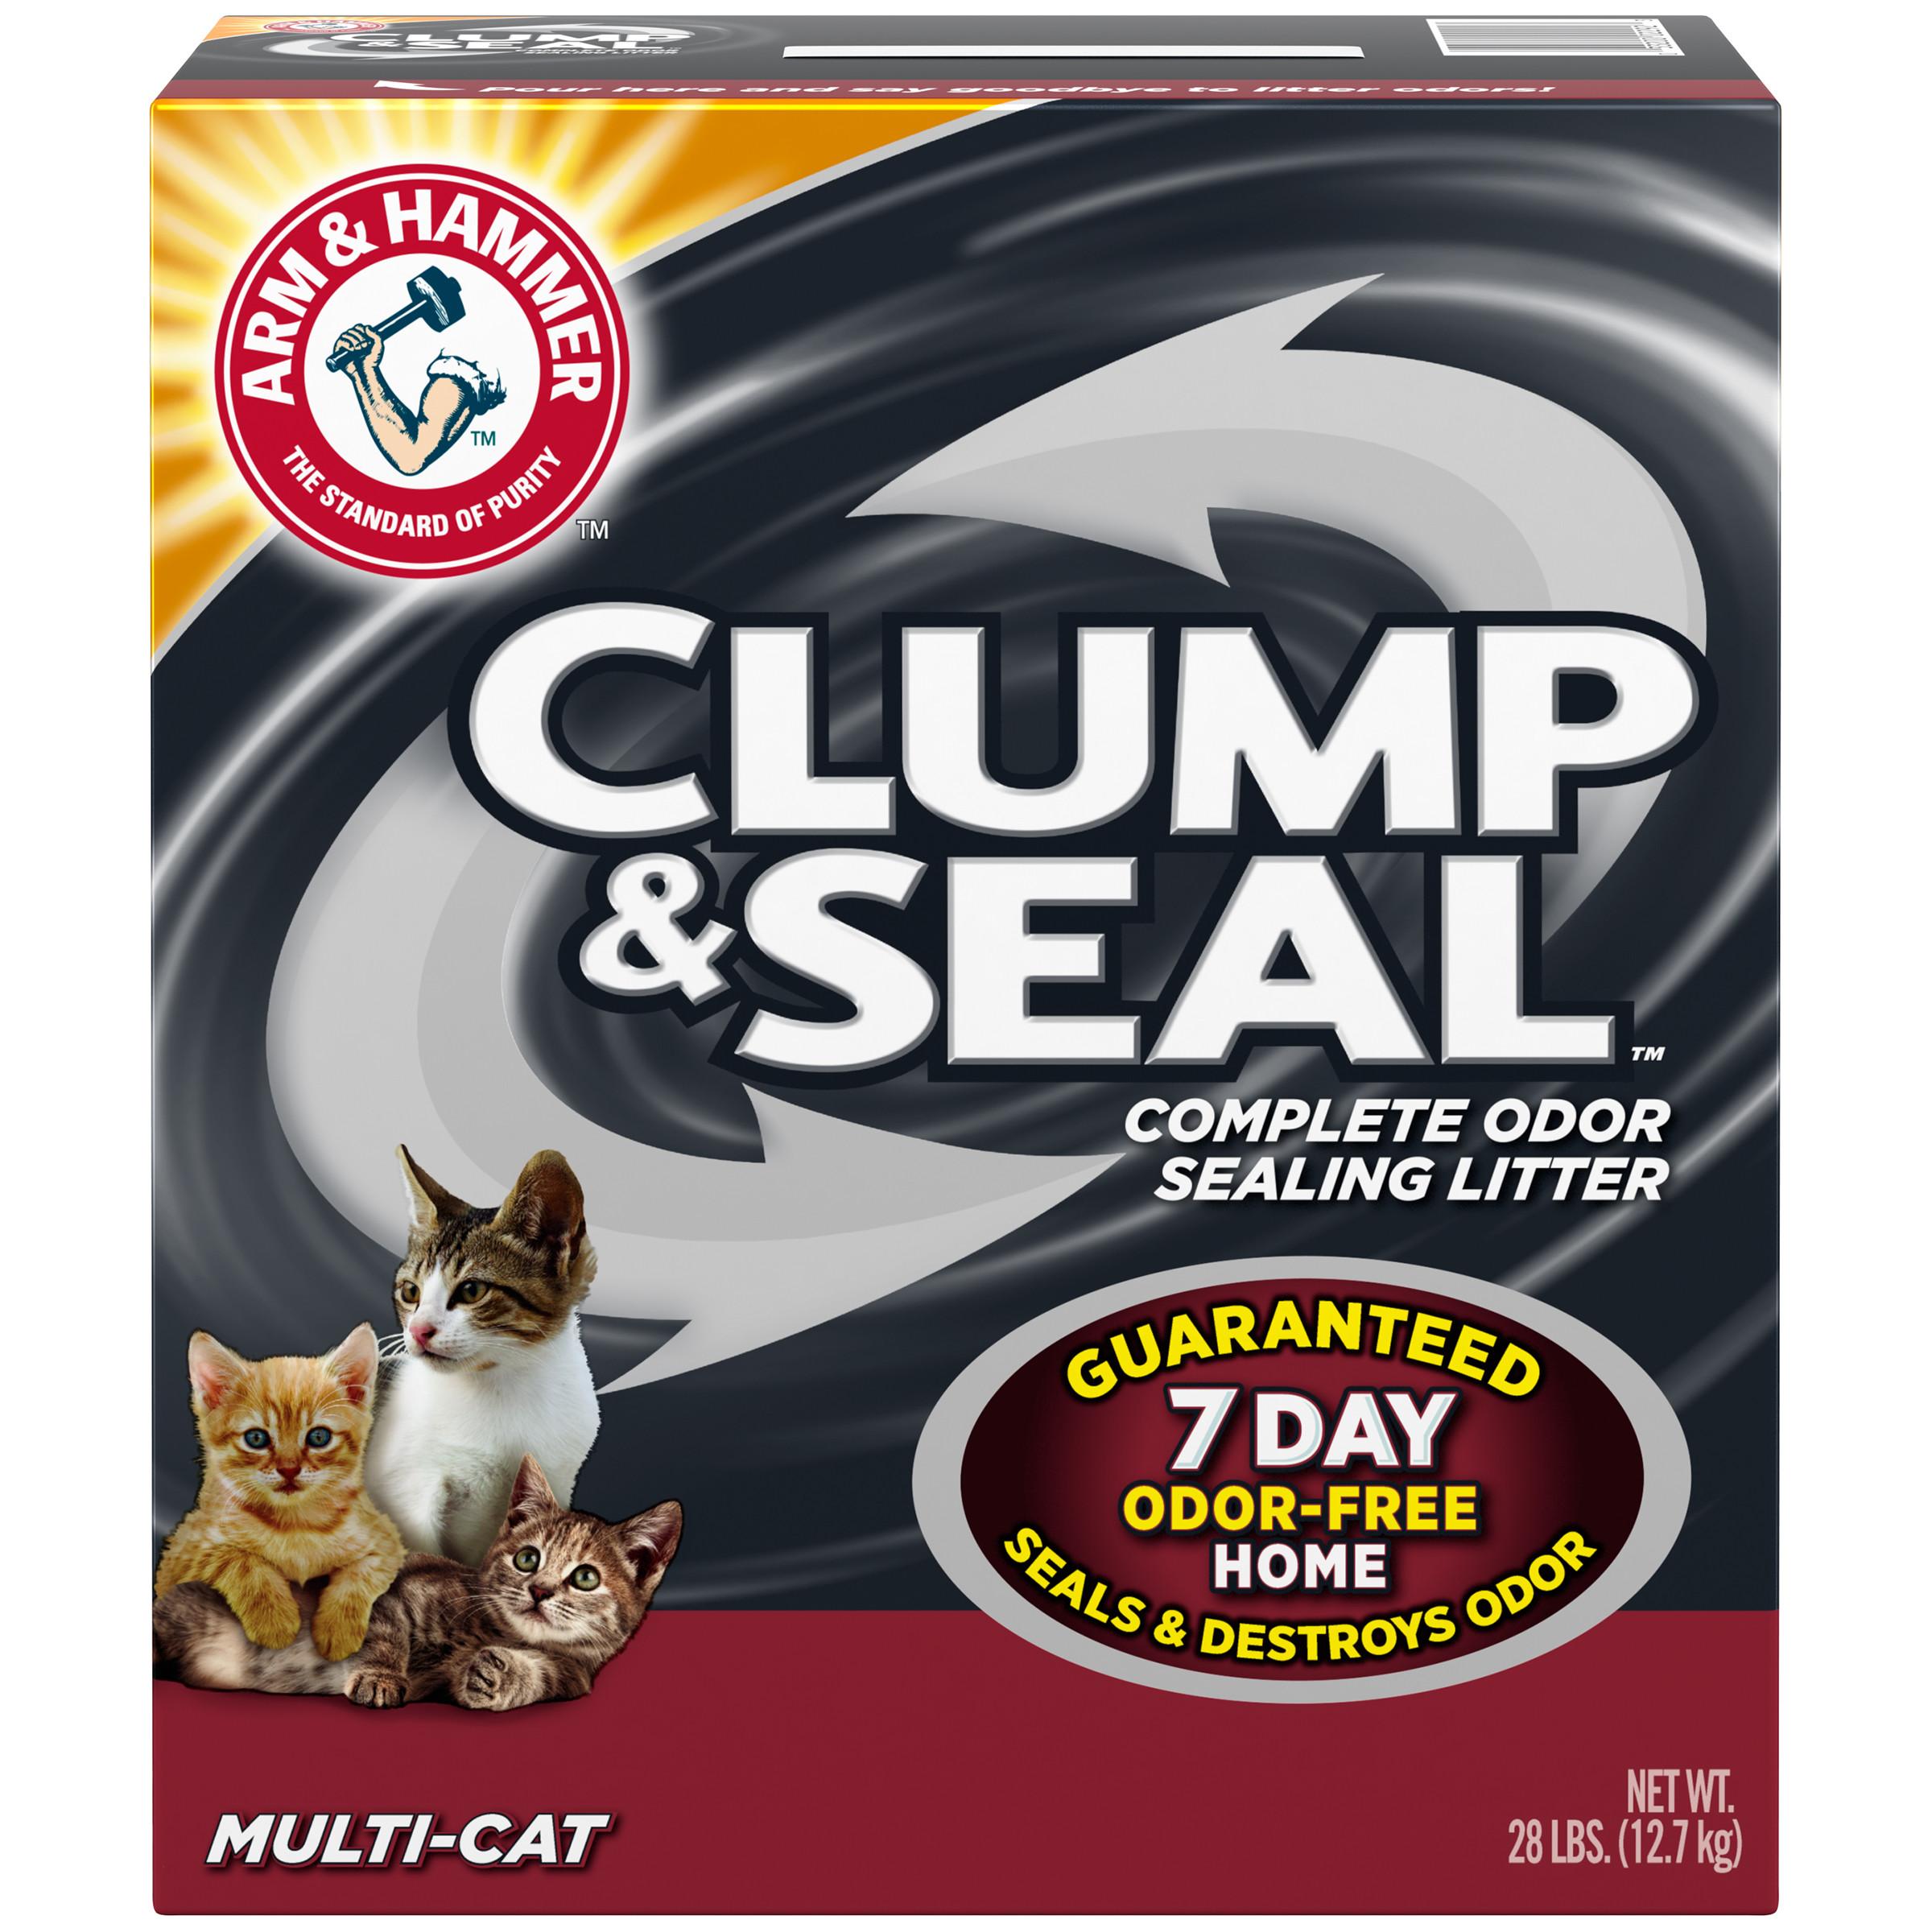 Arm & Hammer Clump & Seal Litter, Multi-Cat 28lb